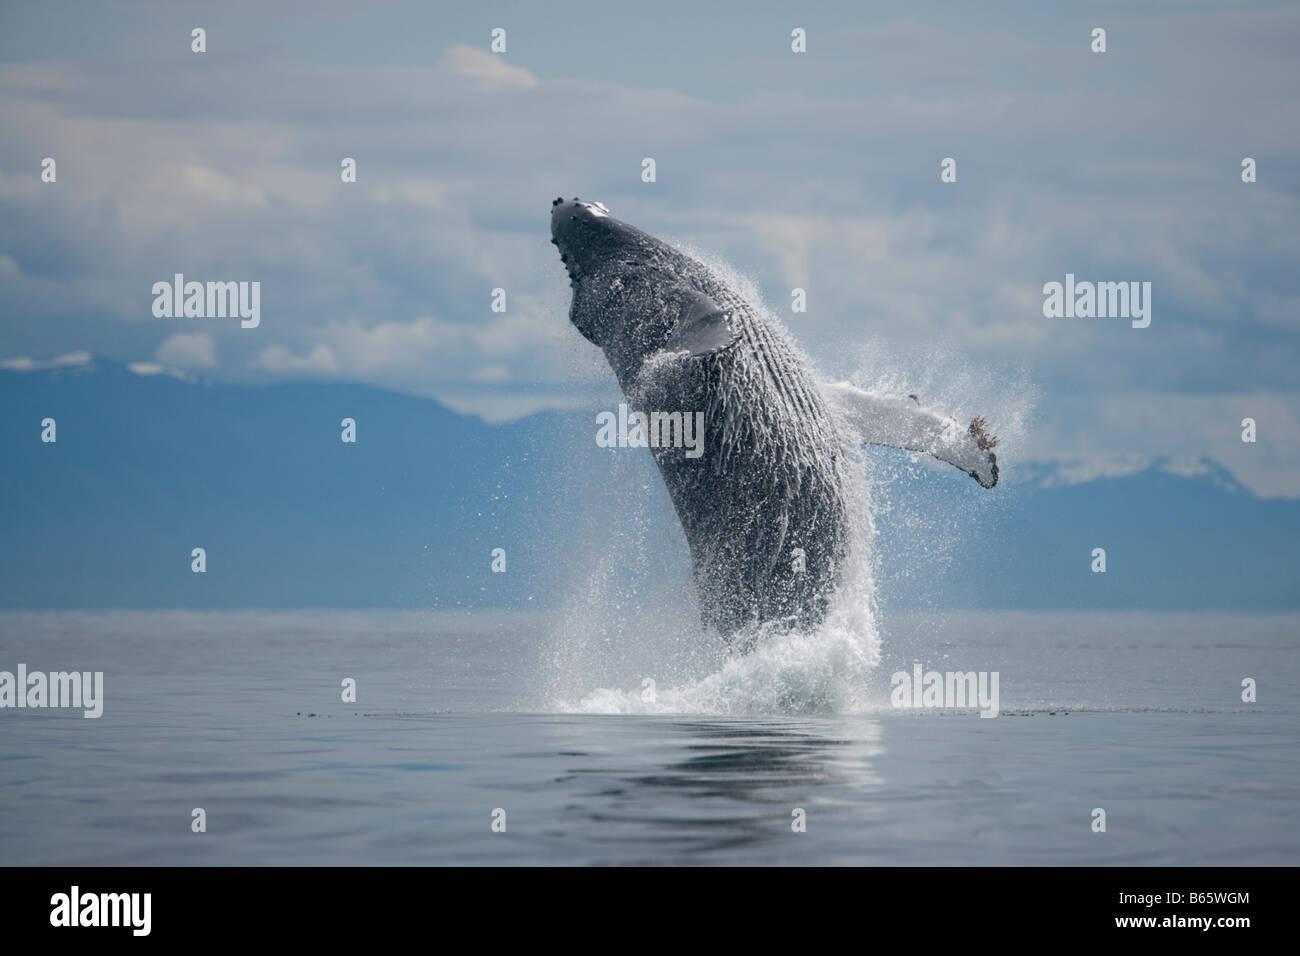 USA Alaska Tongass National Forest Humpback Whale Megaptera novaengliae breaching in Frederick Sound - Stock Image